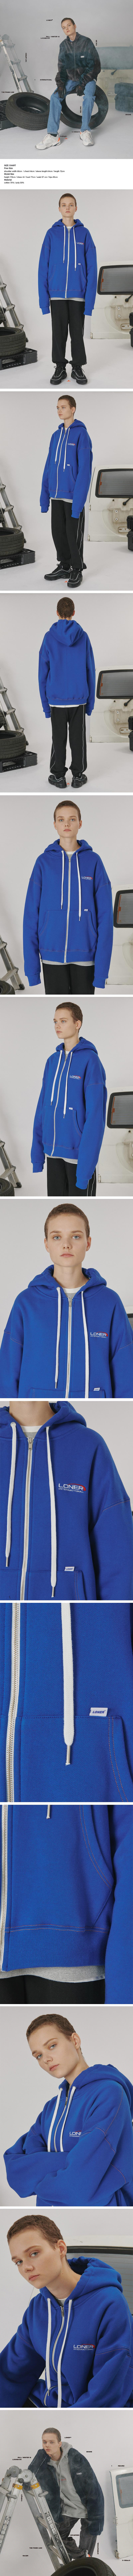 Stitch point hood zipup_blue.jpg